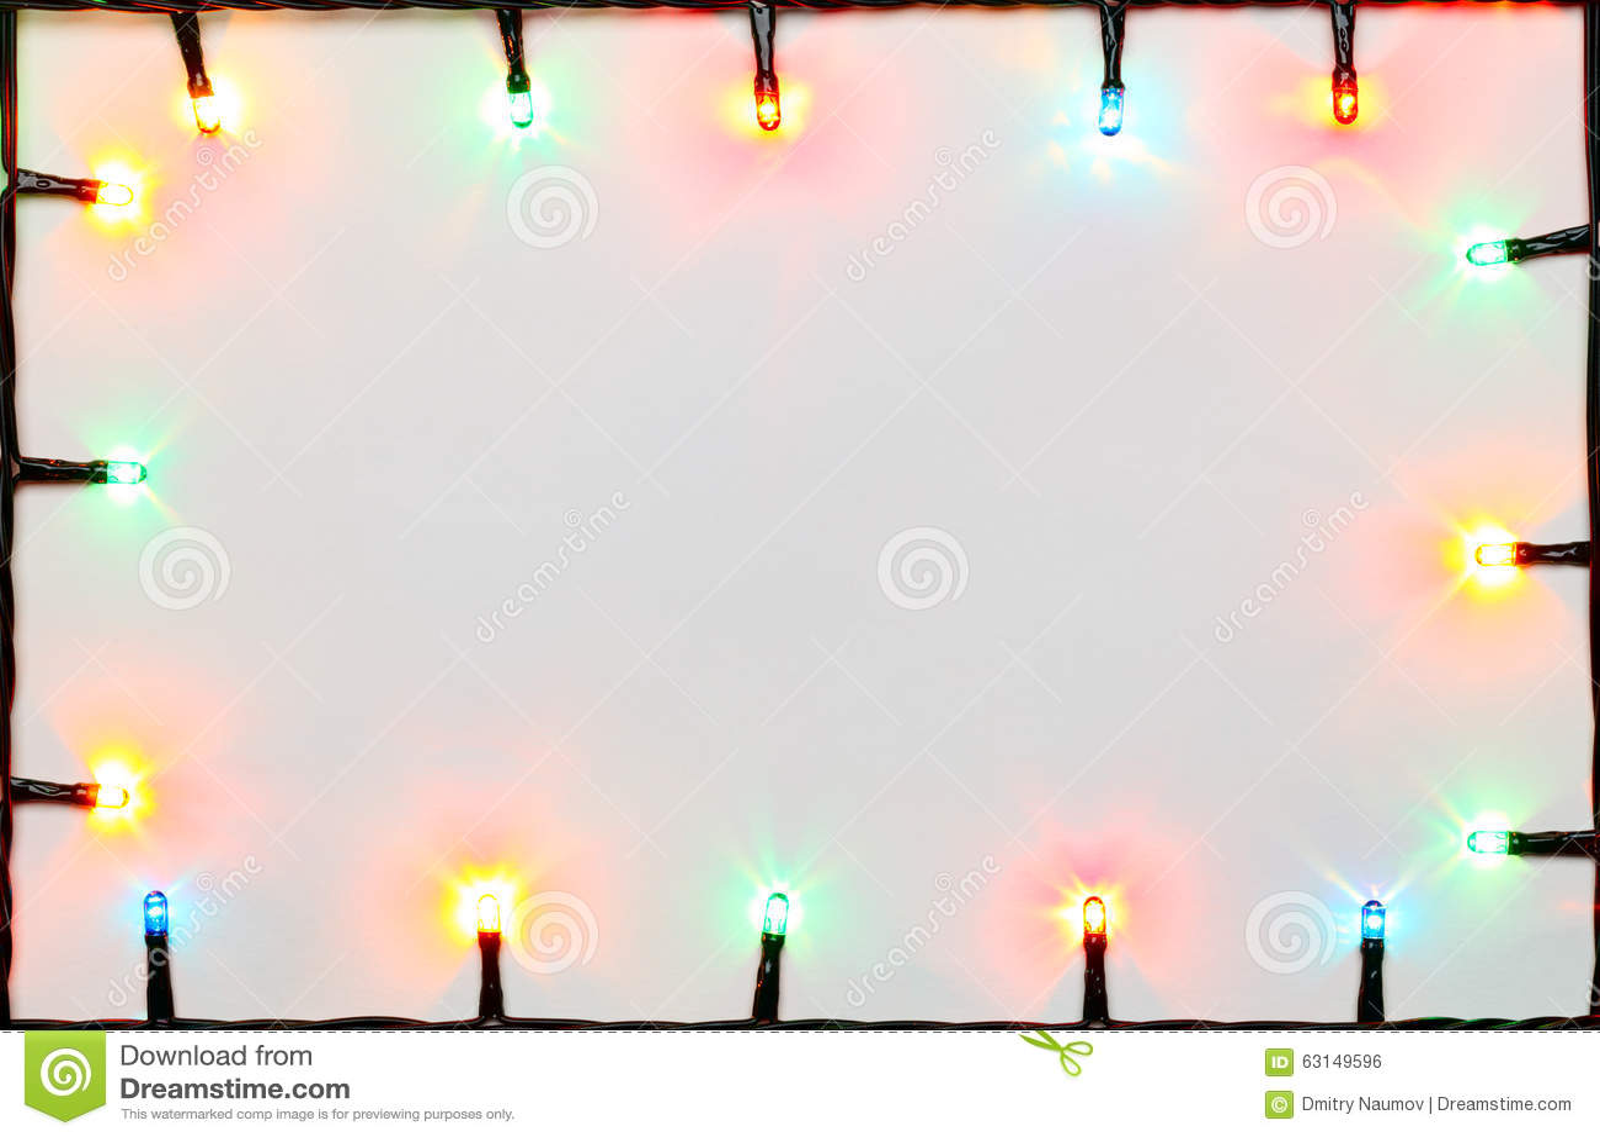 Multicolored Christmas Lights